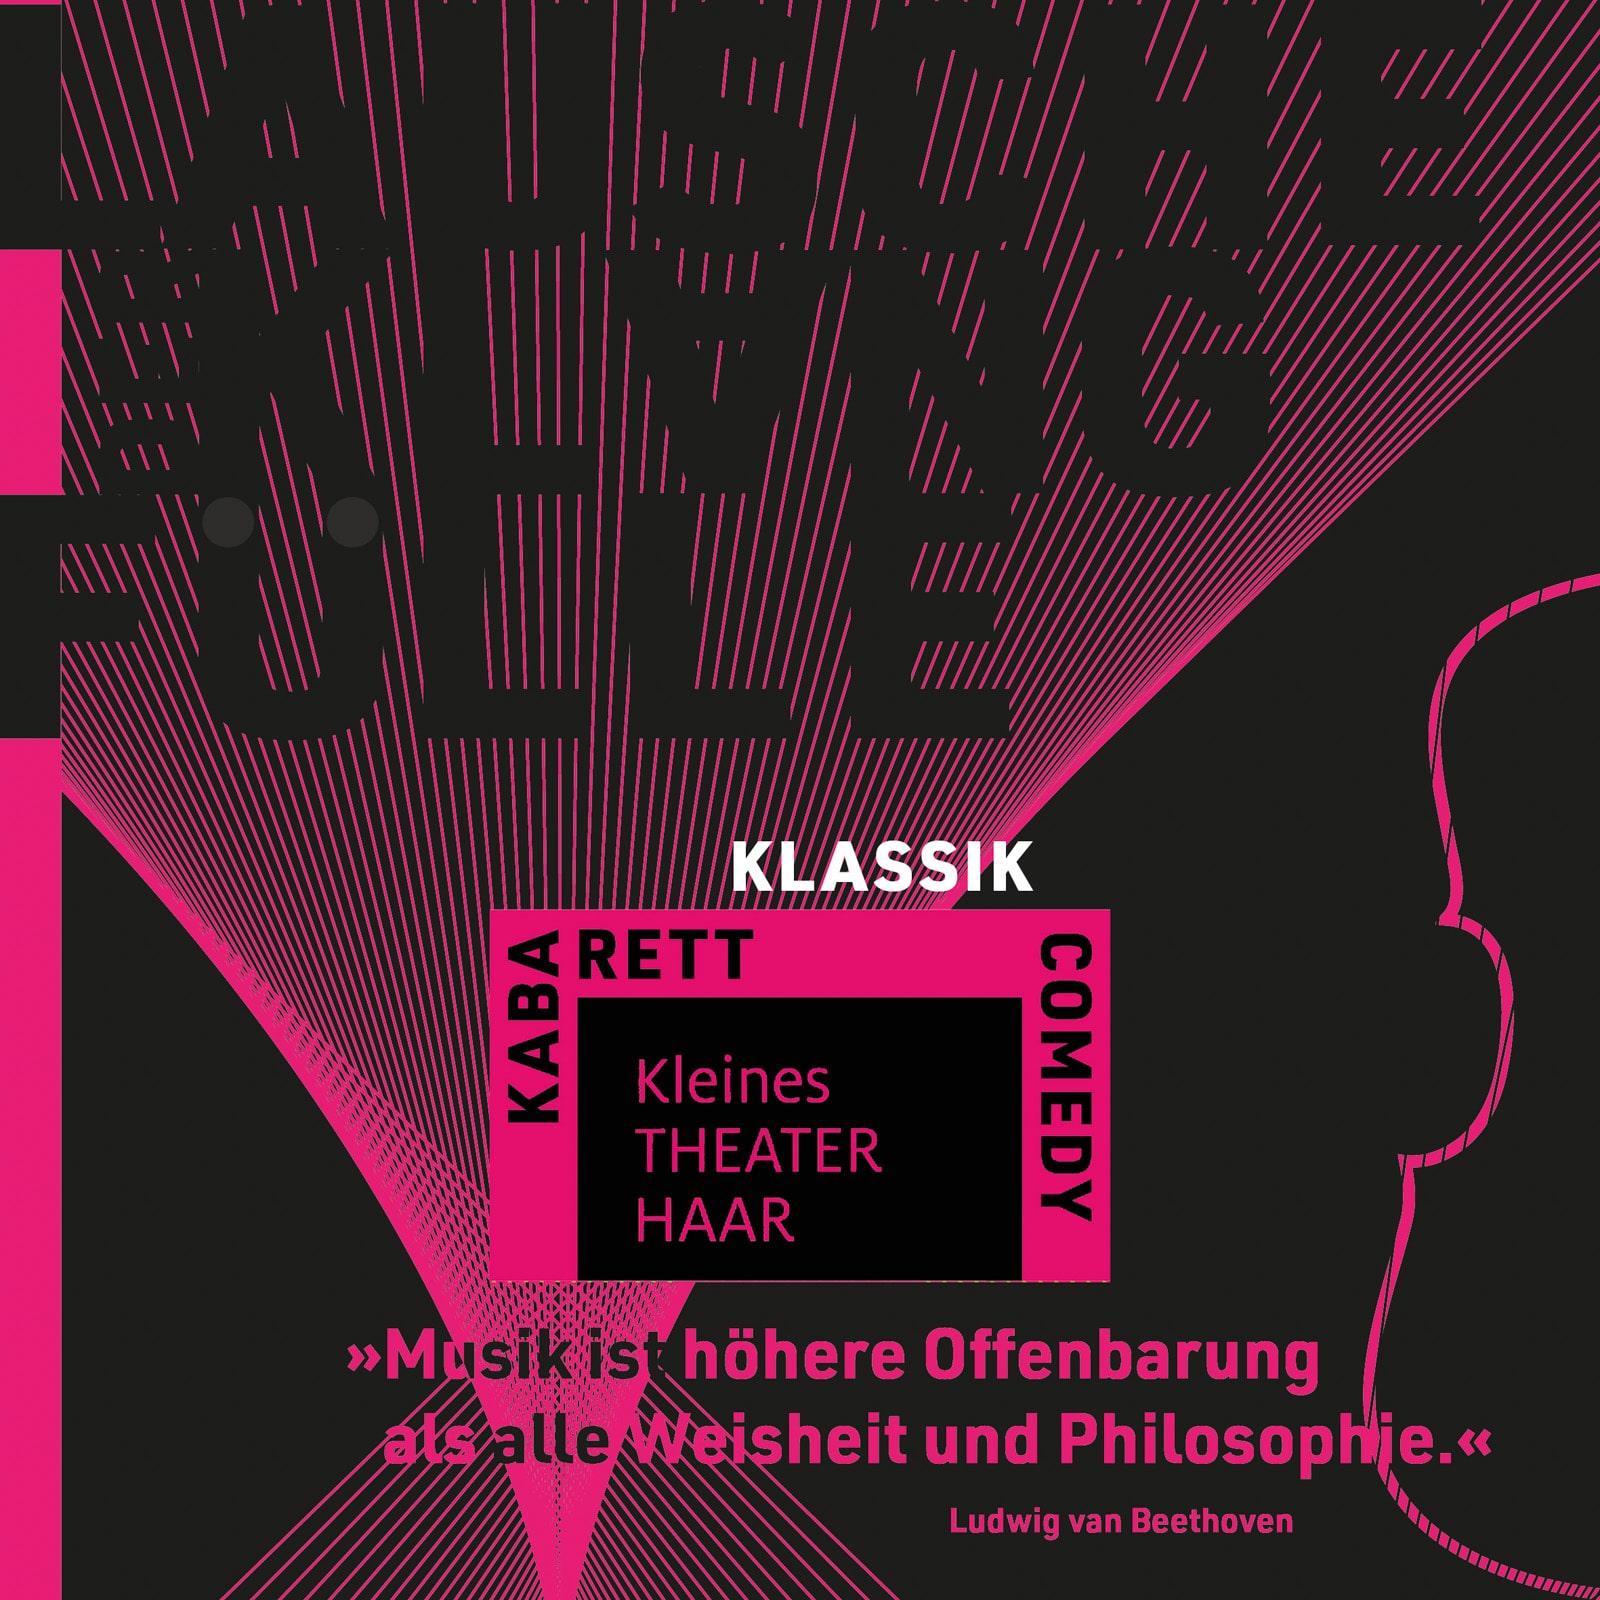 99 Culture Books: Kleines Theater Haar, Plakat 3